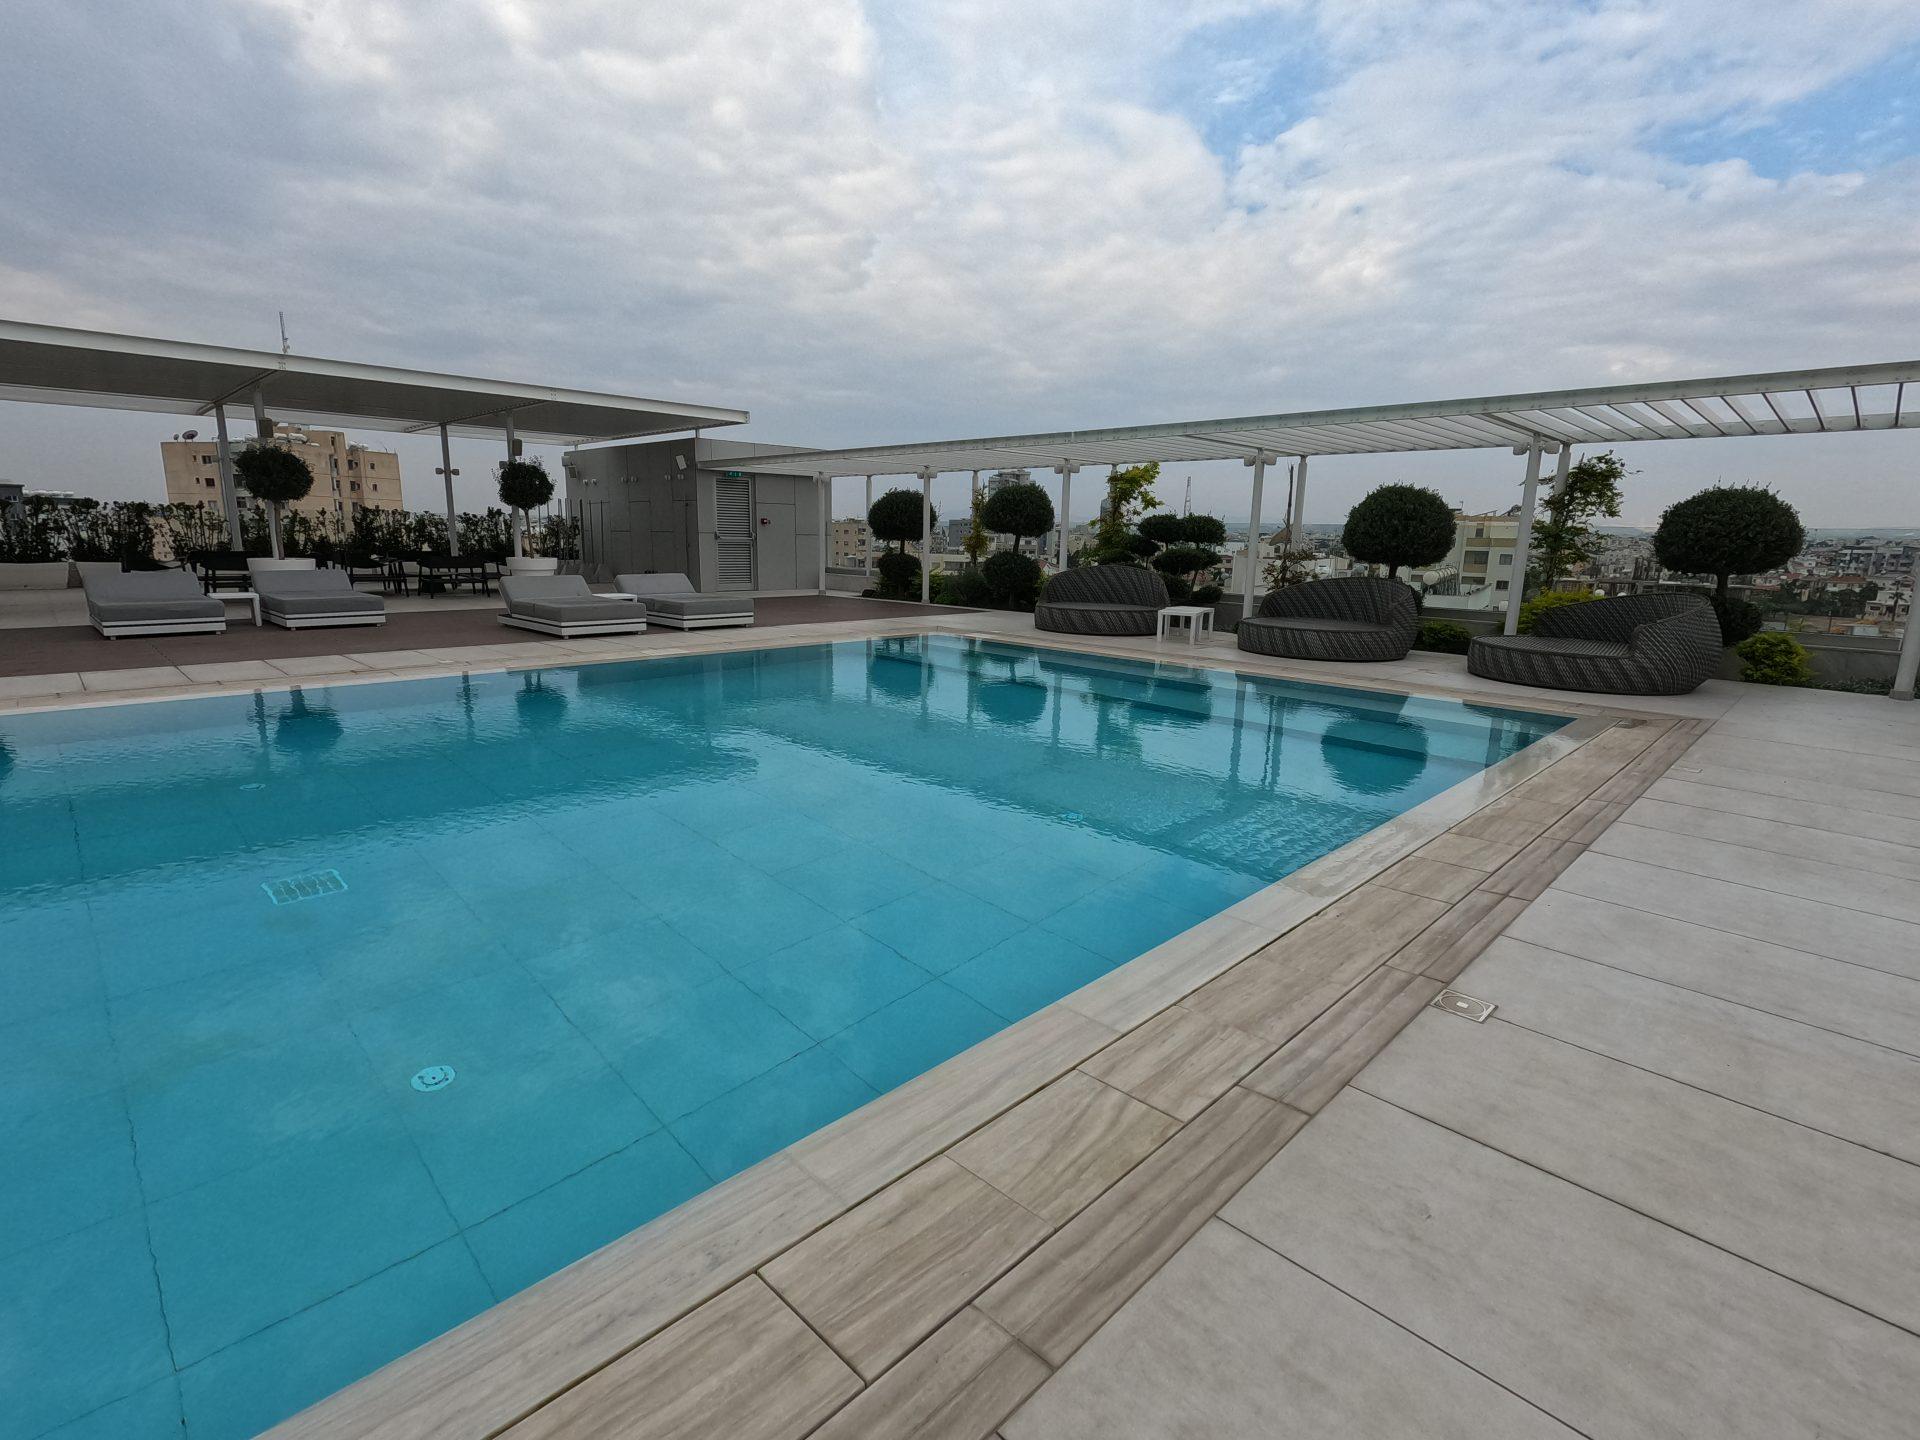 The Outdoor Swimming Pool At Radisson Blu, Larnaca